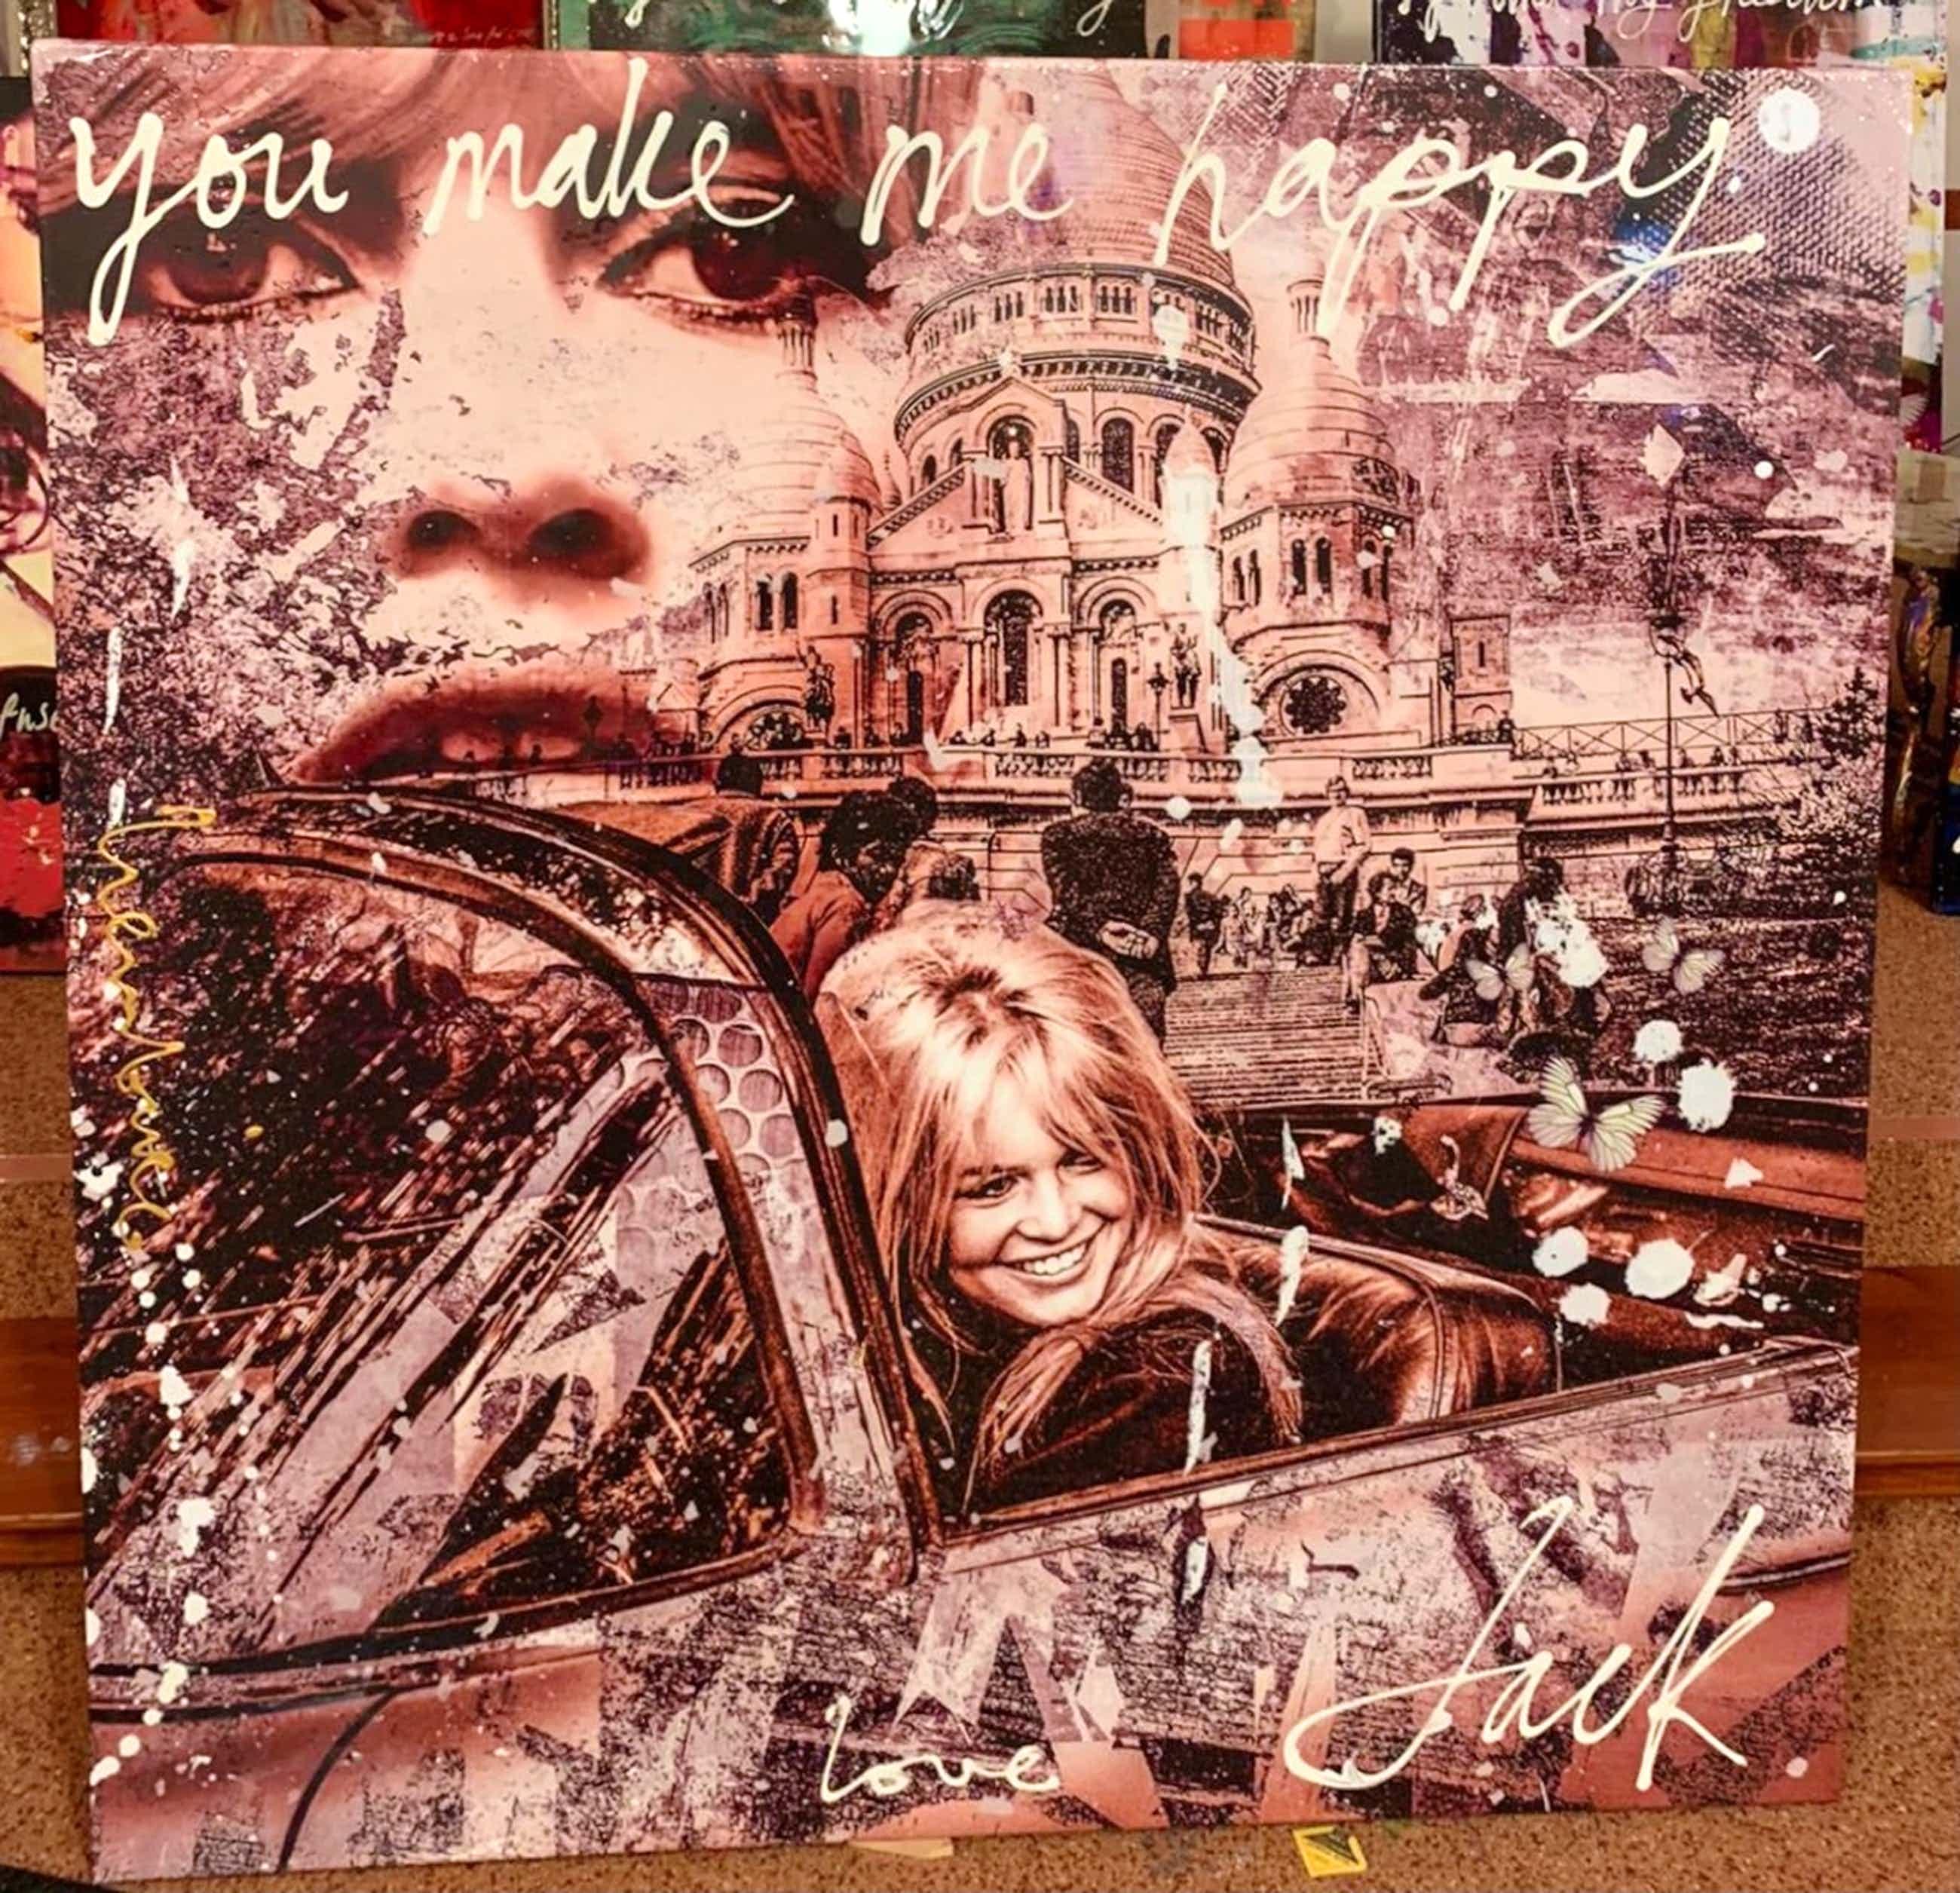 Jack Liemburg - You make me happy - Brigitte Bardot kopen? Bied vanaf 450!